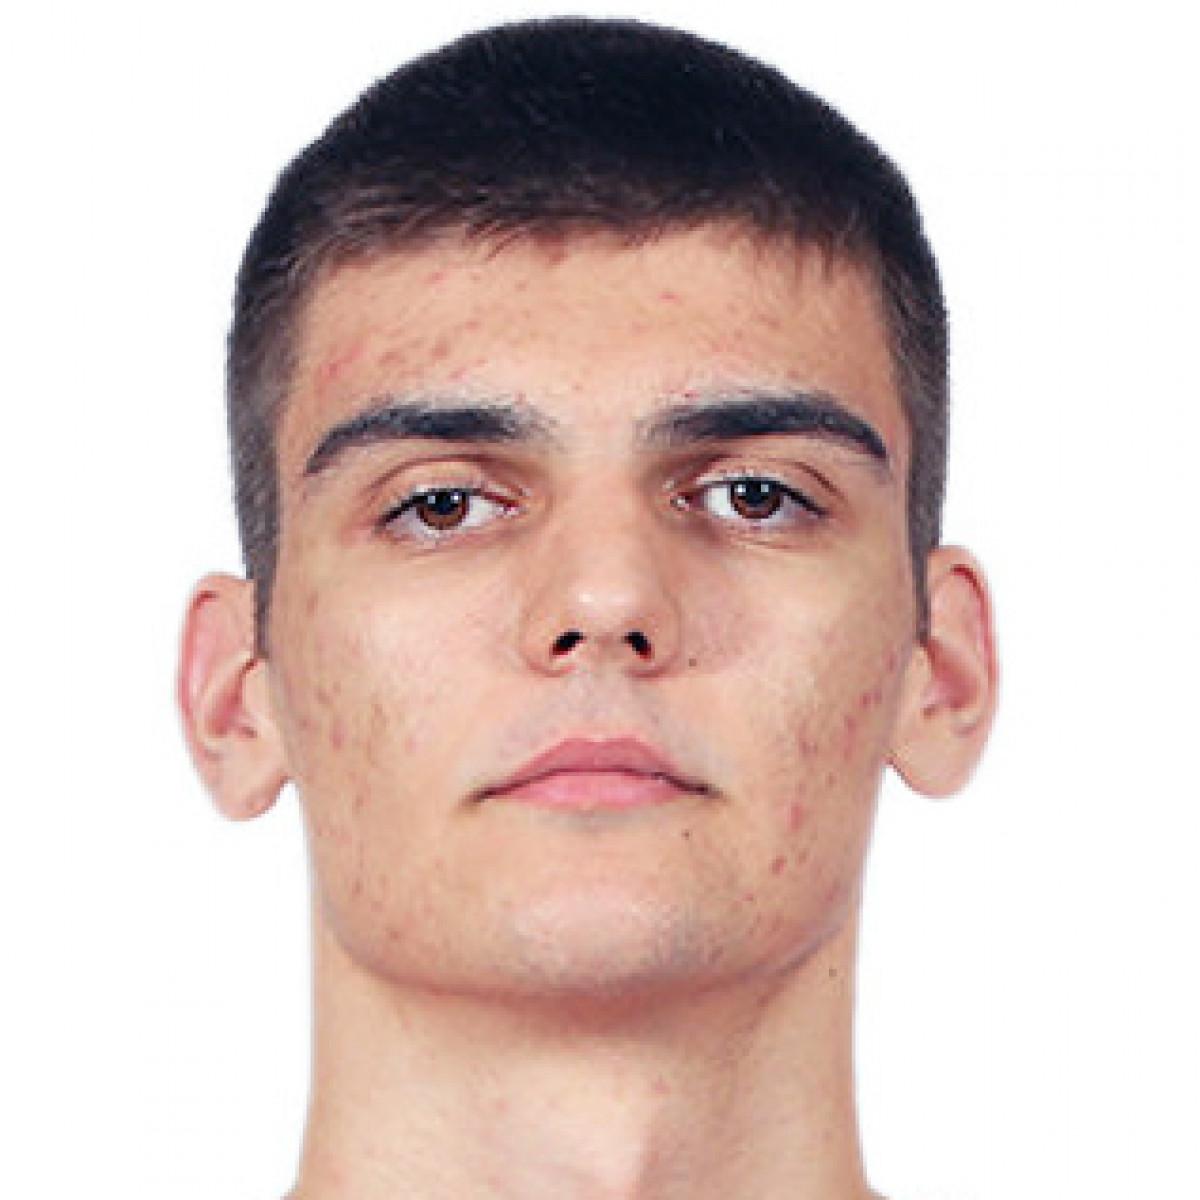 Nikolaos Tsolakis